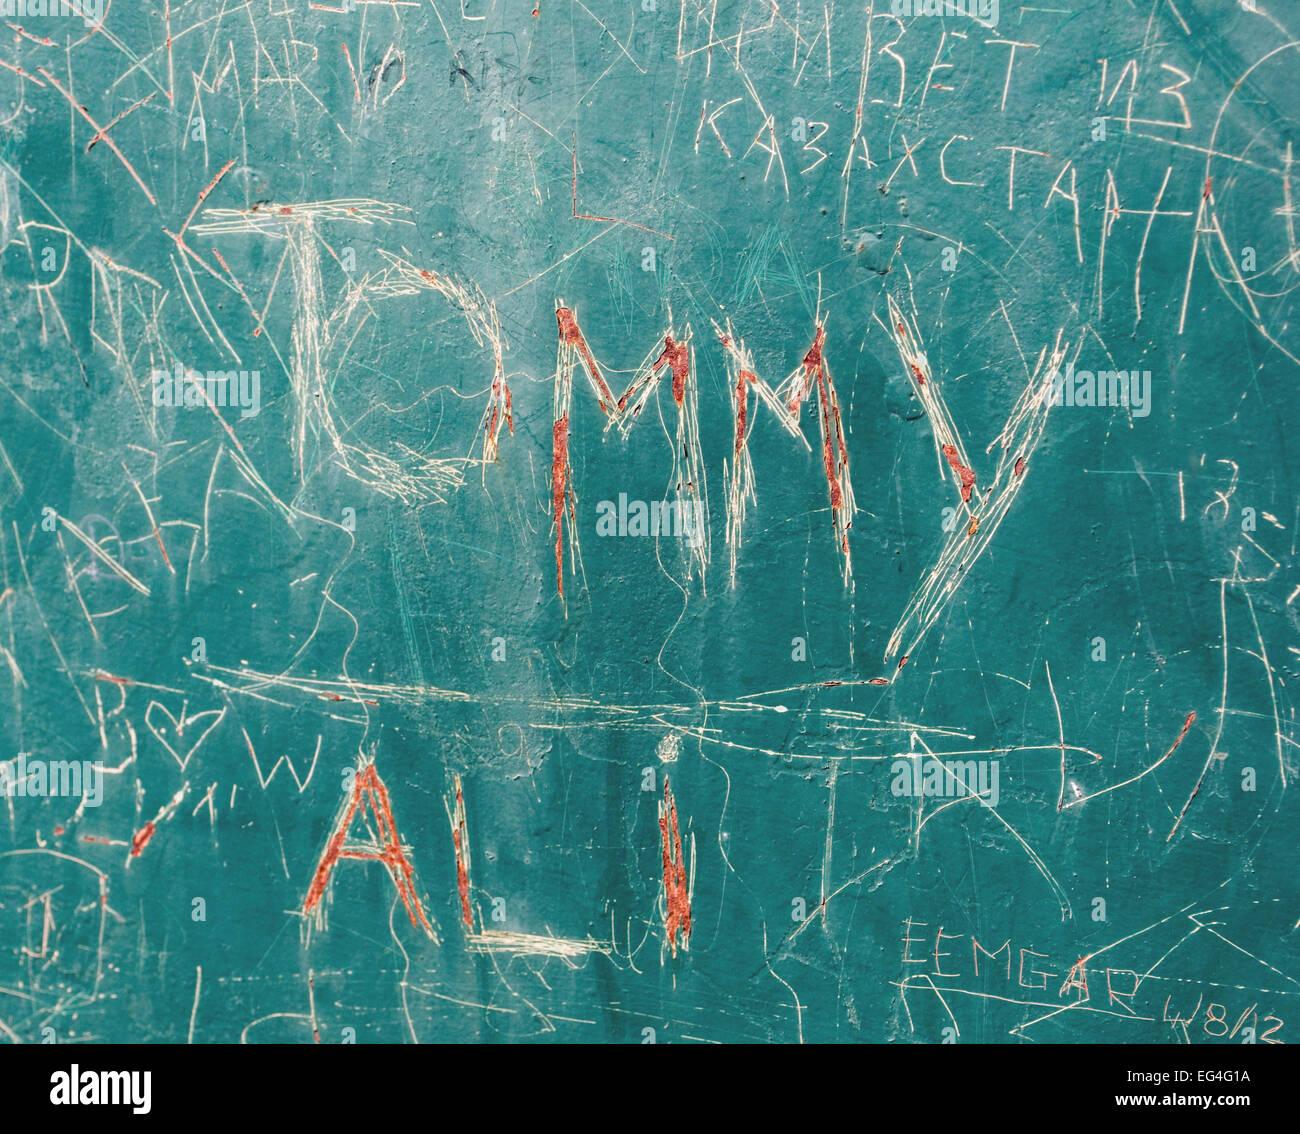 identity name graffiti - Stock Image